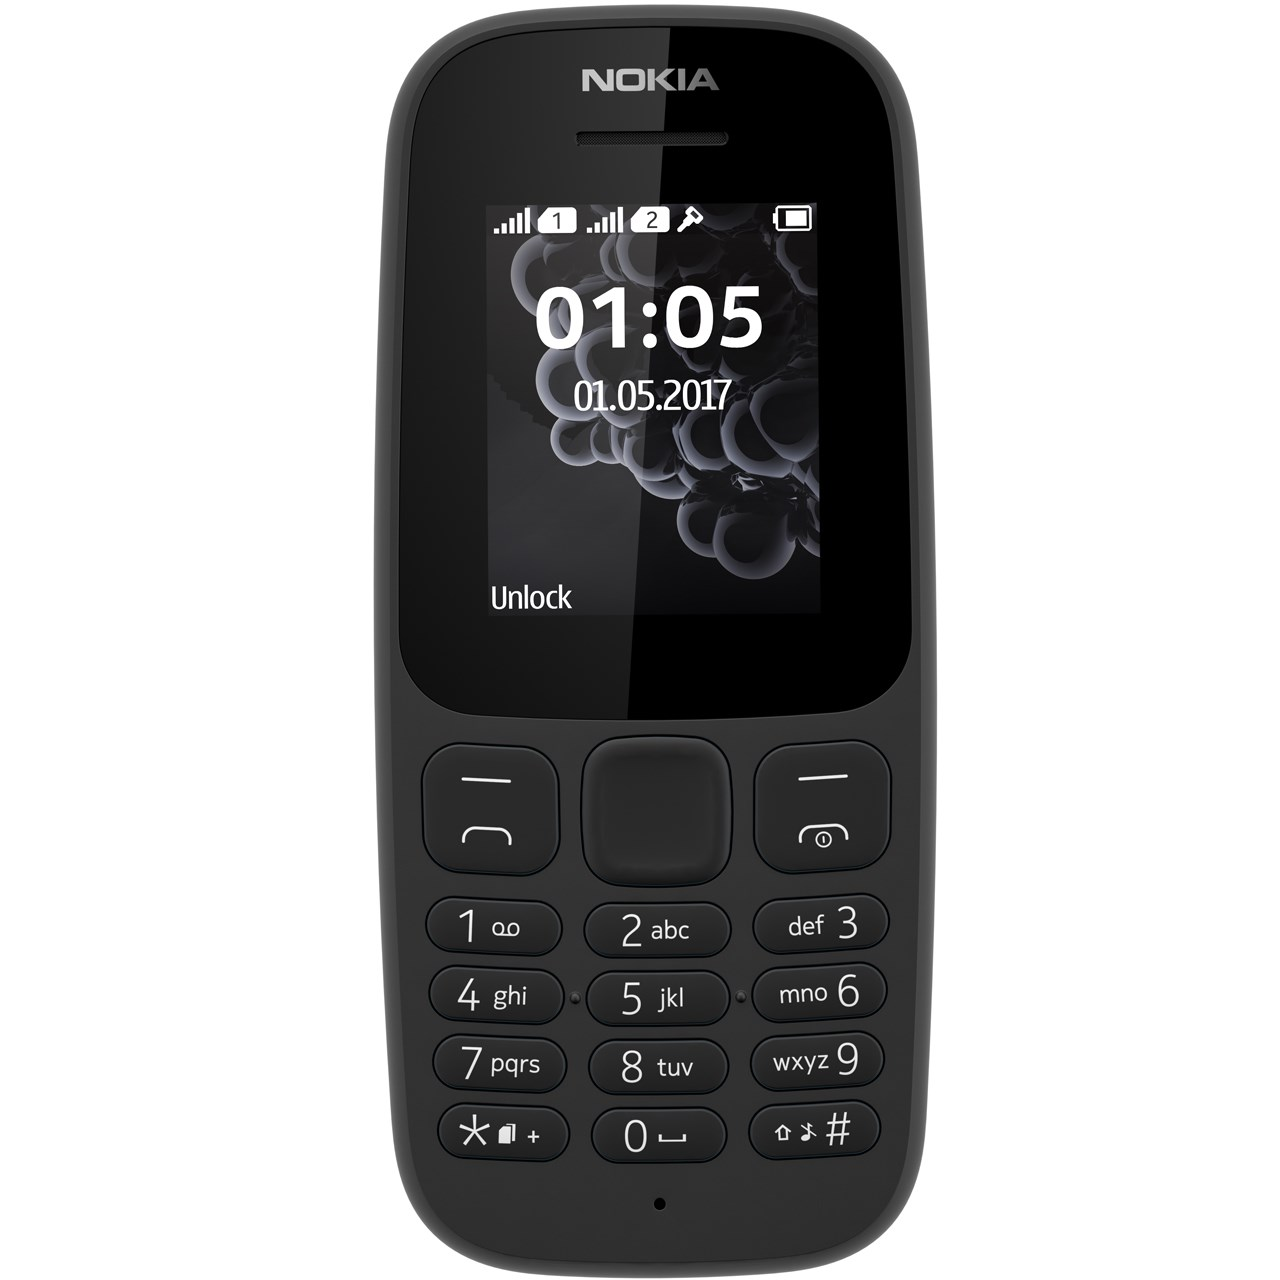 گوشی موبایل نوکیا مدل 105 -TA1034 دو سیم کارت